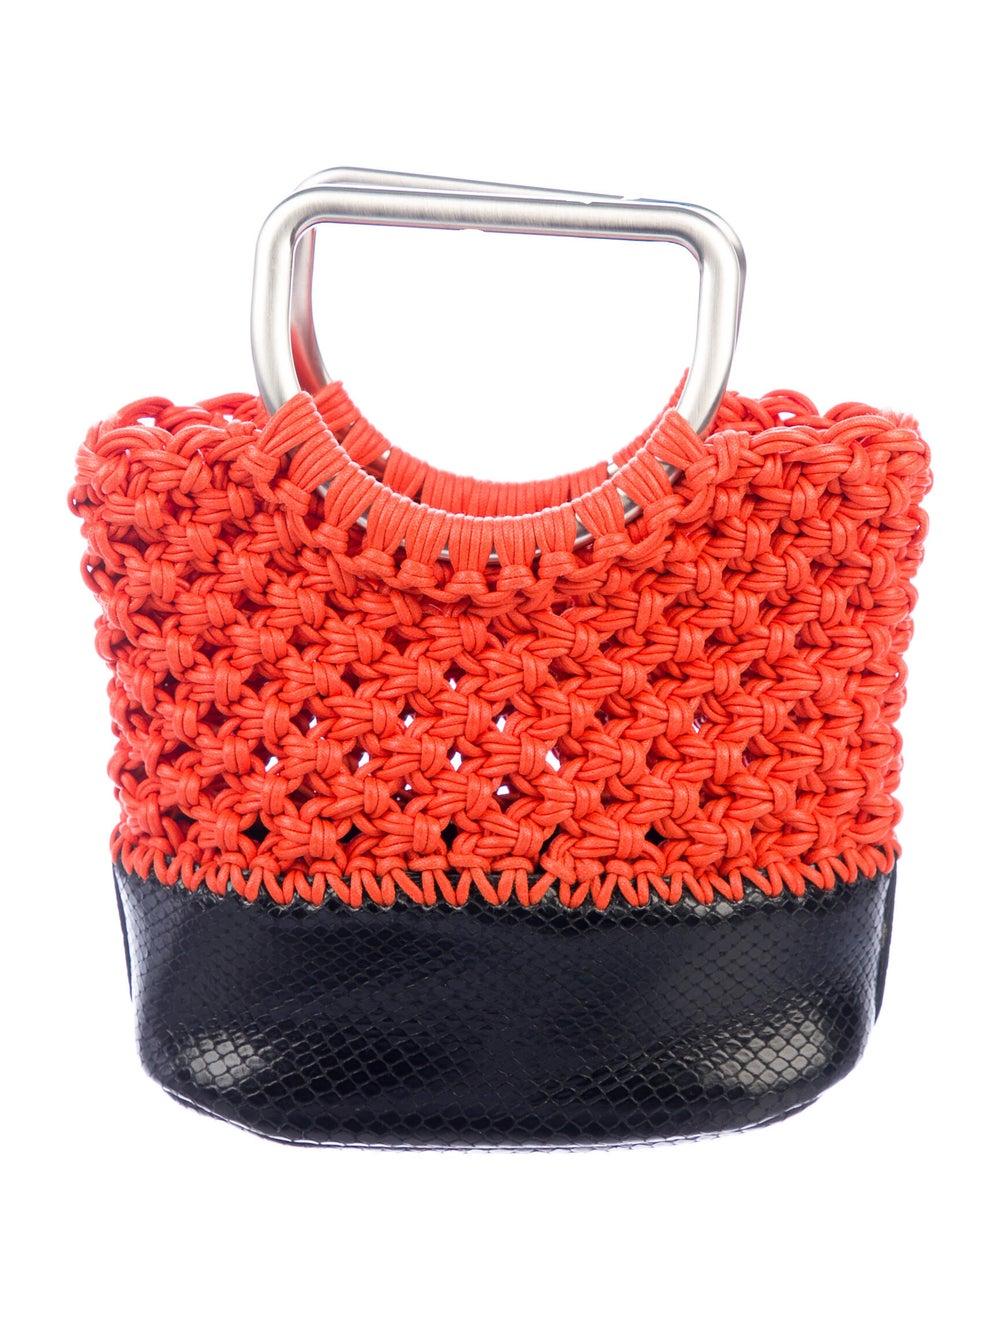 Proenza Schouler Small Market Macrame Bag Orange - image 1